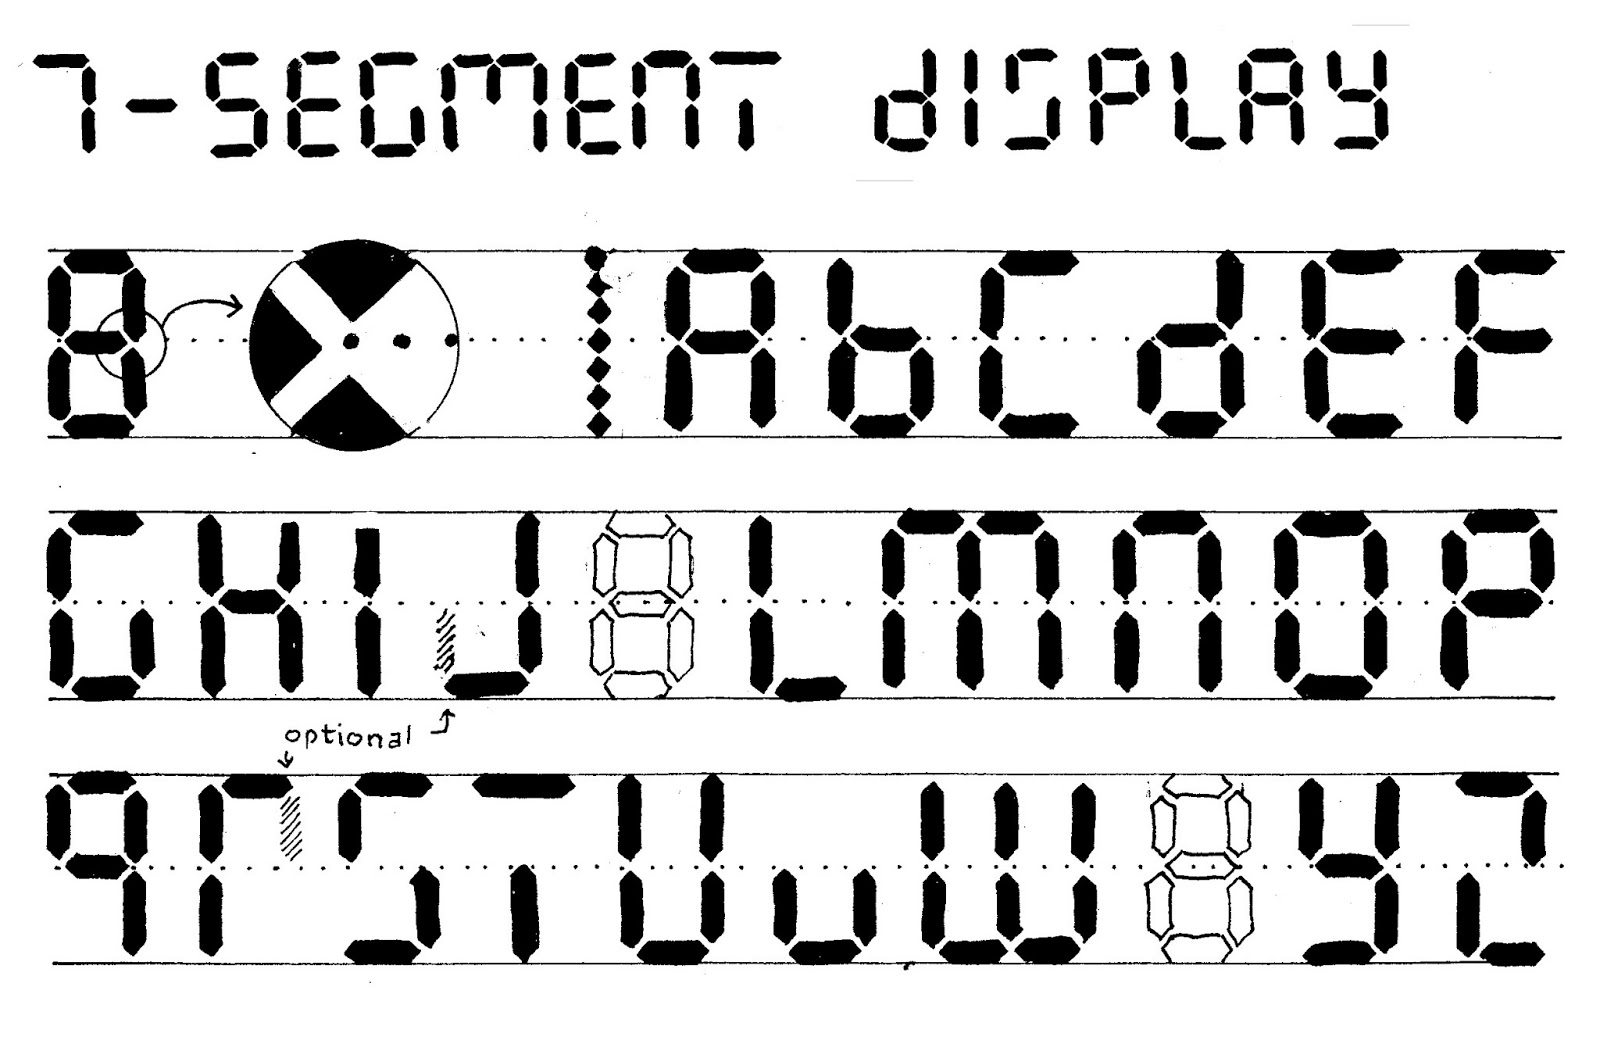 Margaret Shepherd Calligraphy Blog 114 7 Segment Display Segments Of Seven